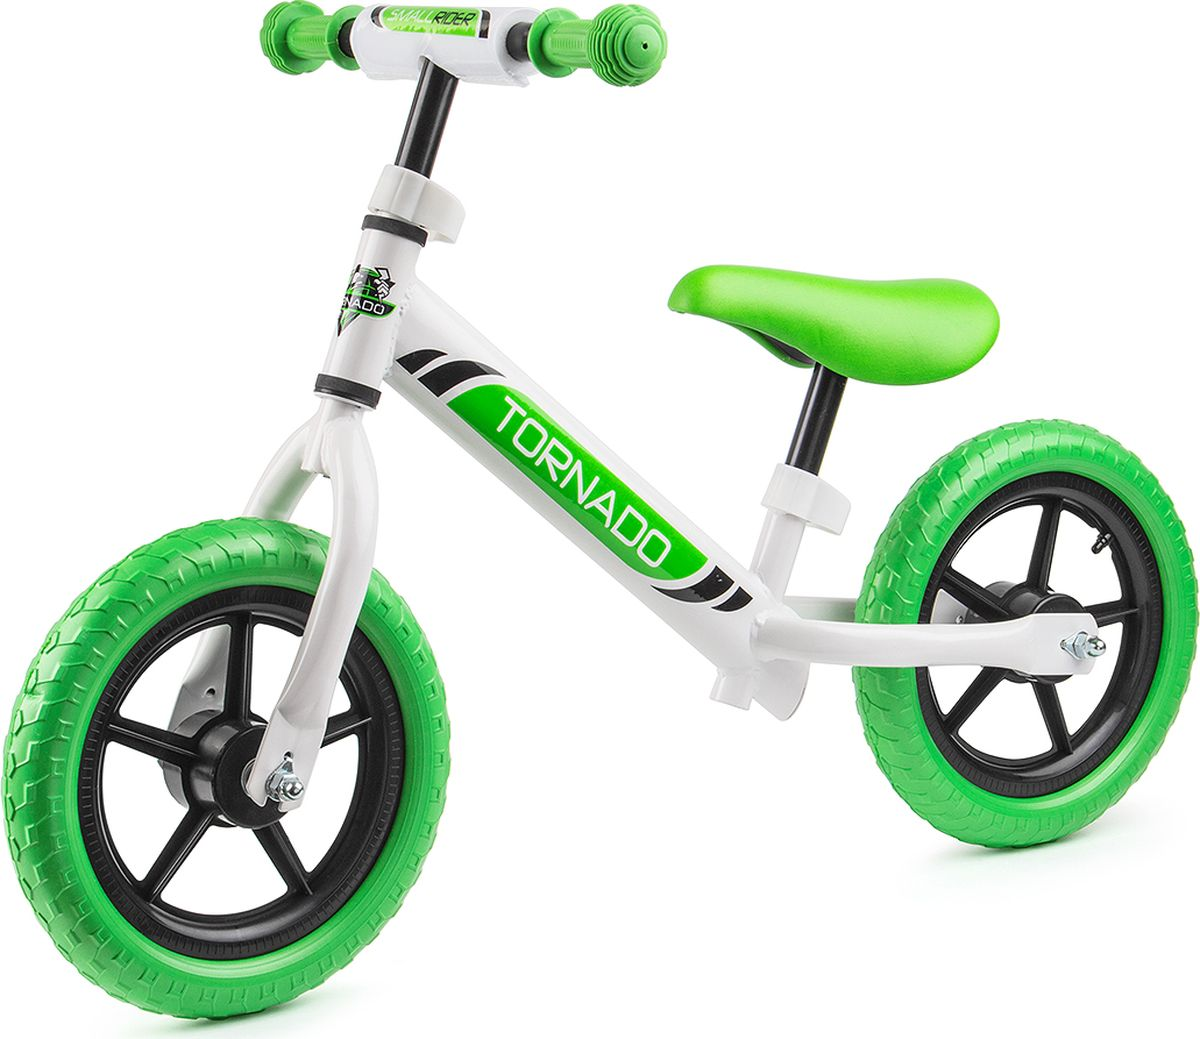 Small Rider Беговел детский Tornado цвет белый зеленый -  Беговелы